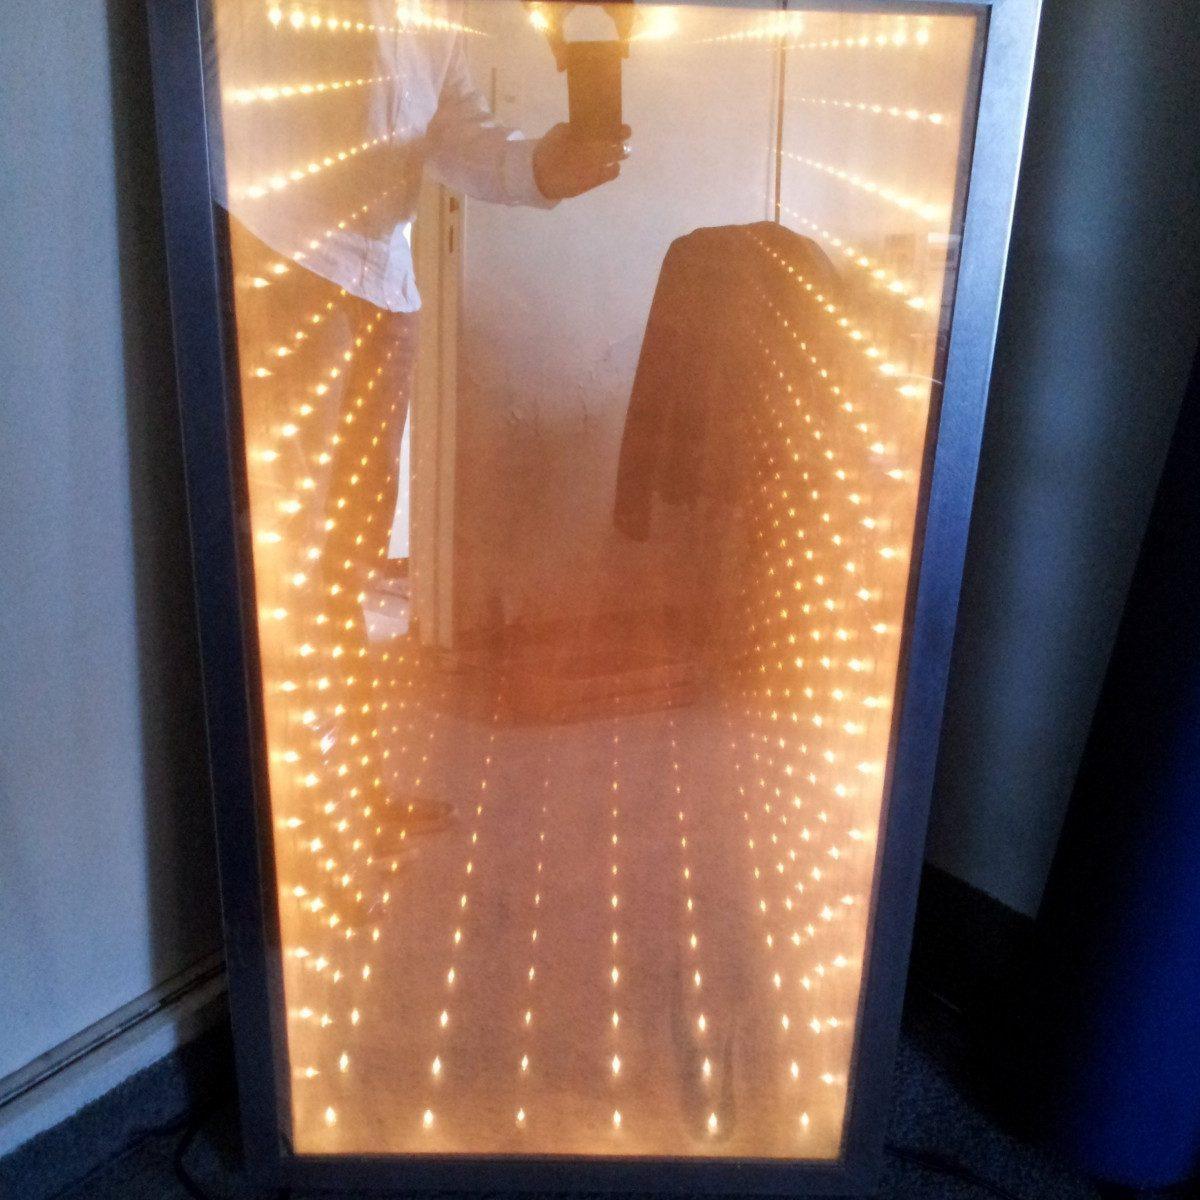 Importante Espejo Retro Marco Metalico Interior Con Luces - $ 4.500 ...